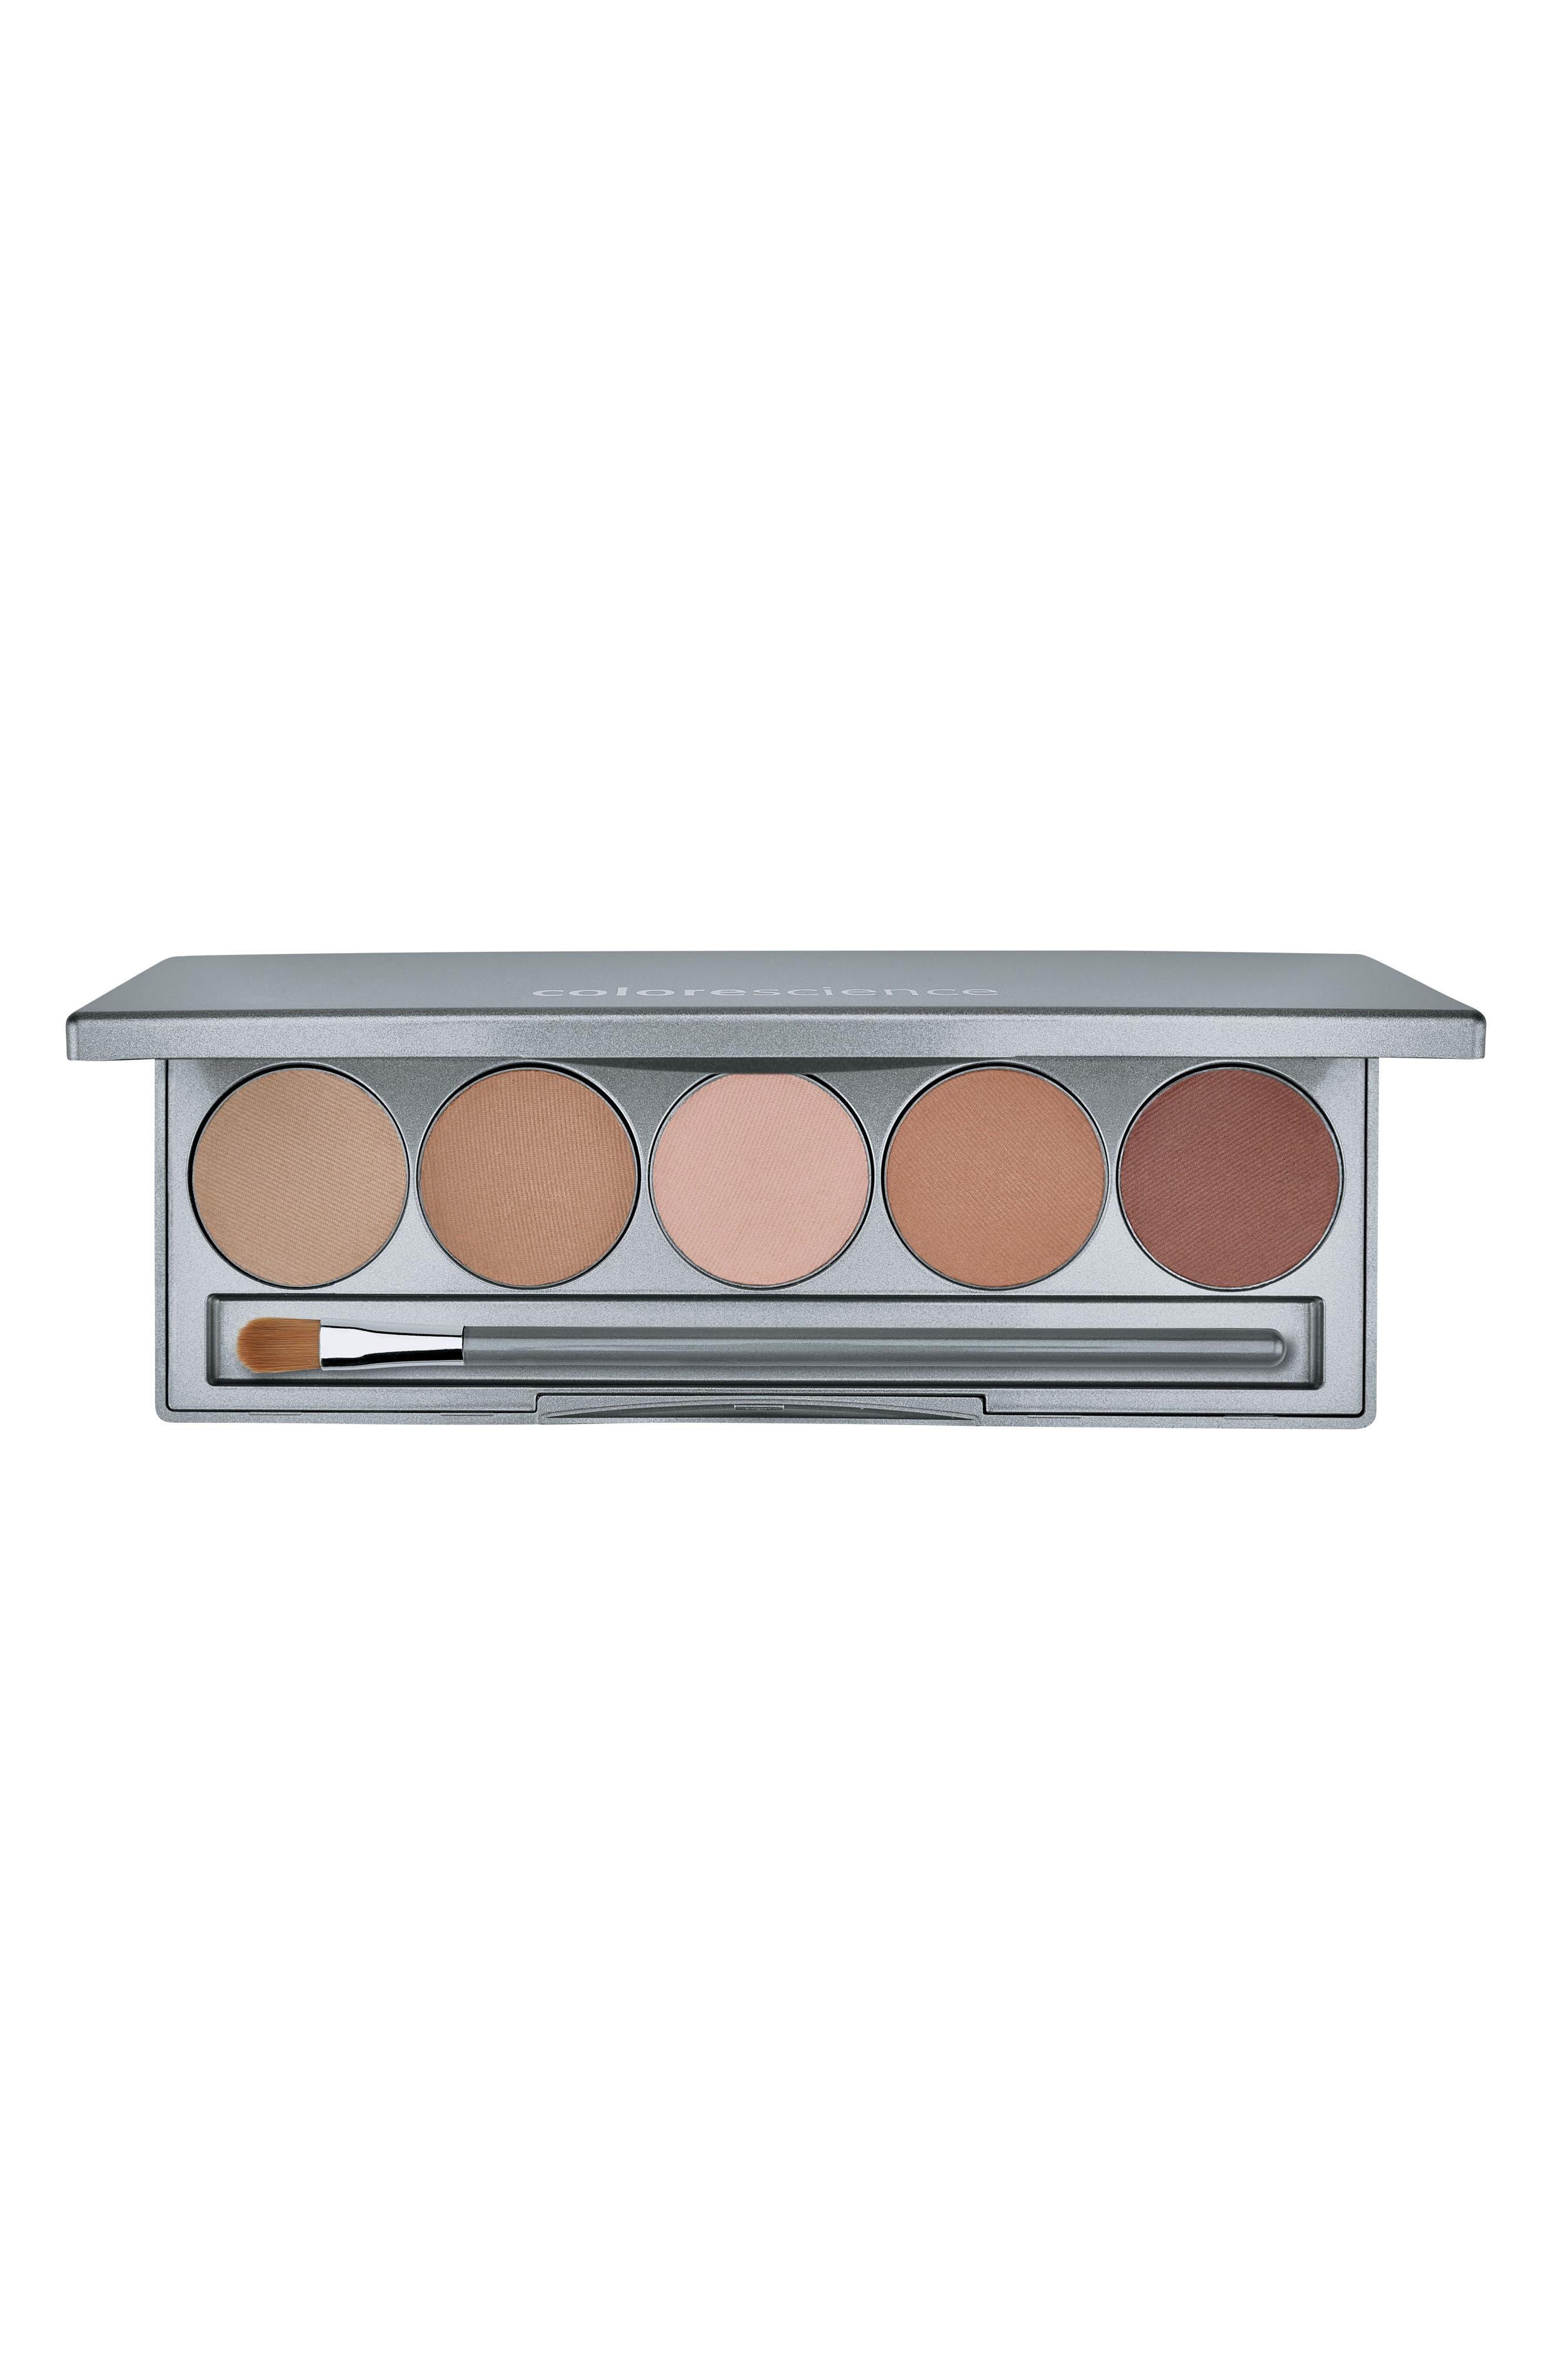 Main Image - Colorescience® Mineral Corrector Palette SPF 20